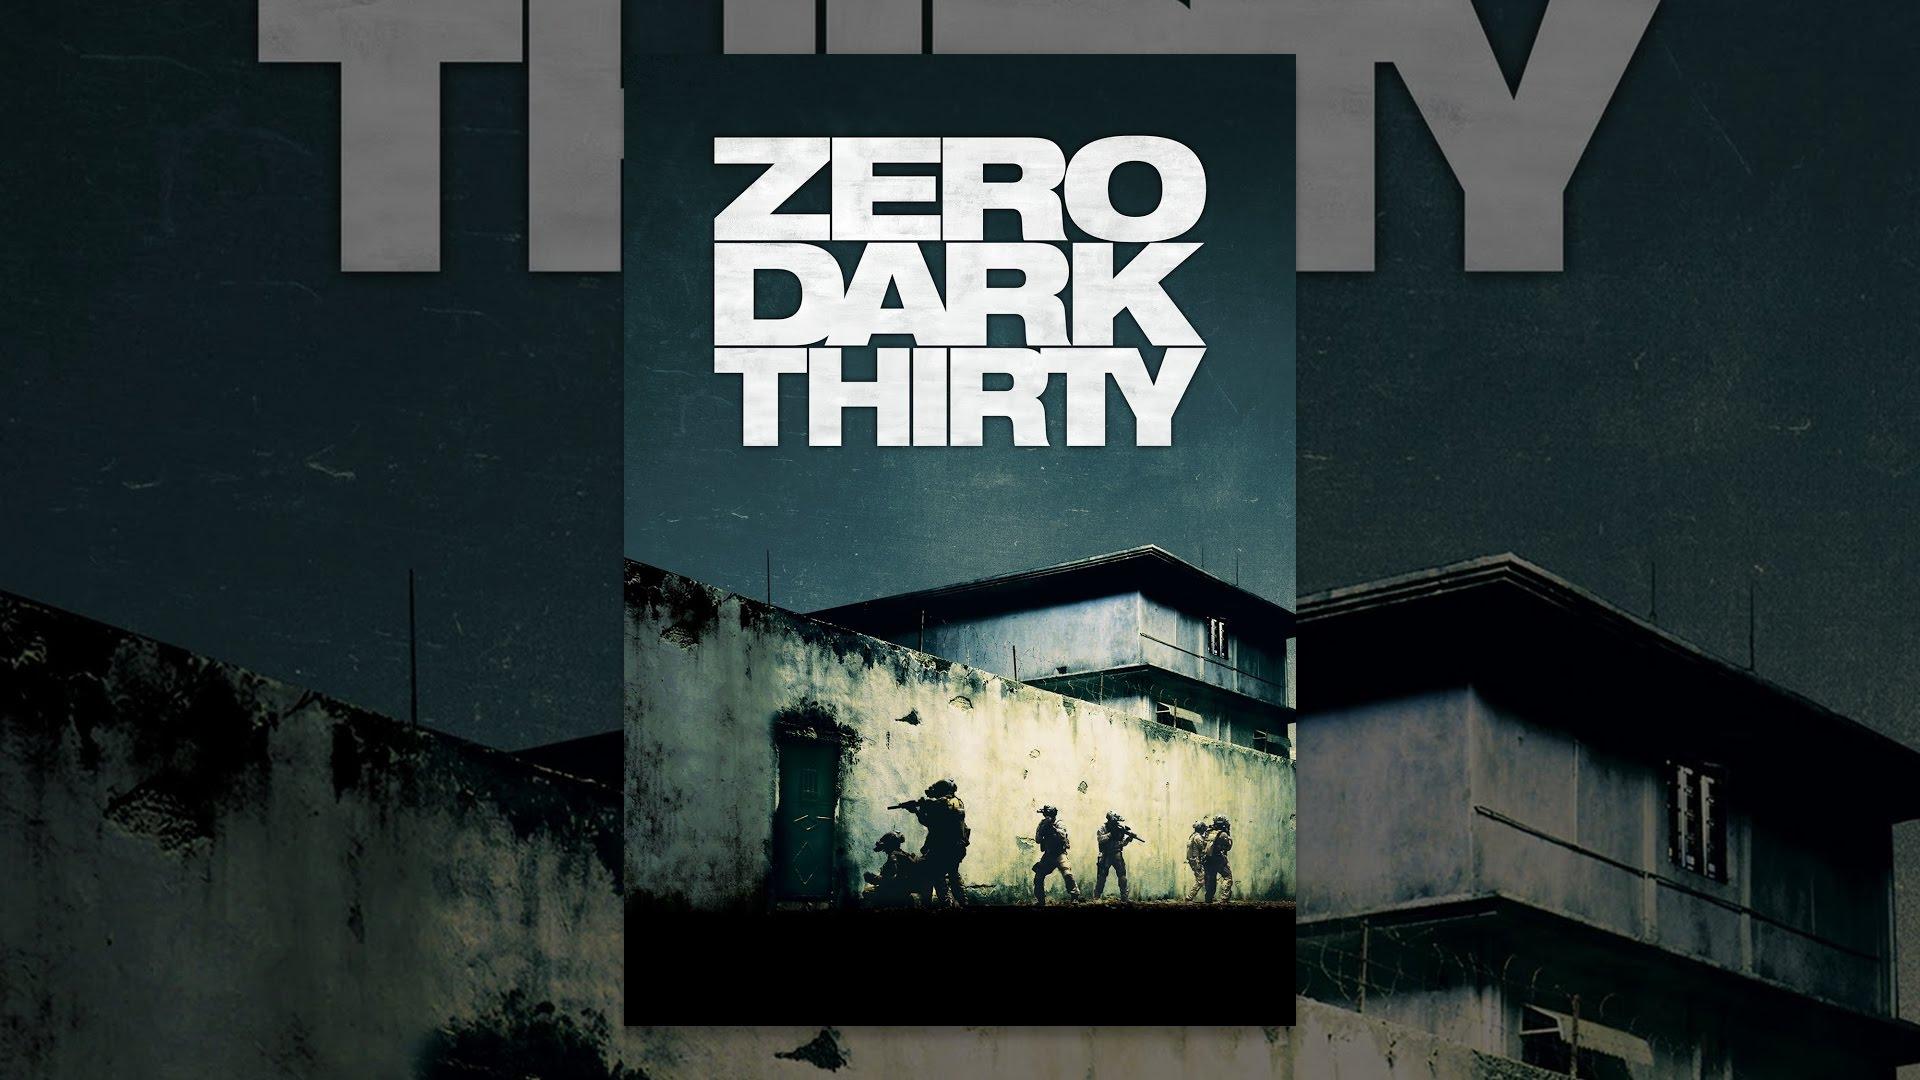 Download Zero Dark Thirty